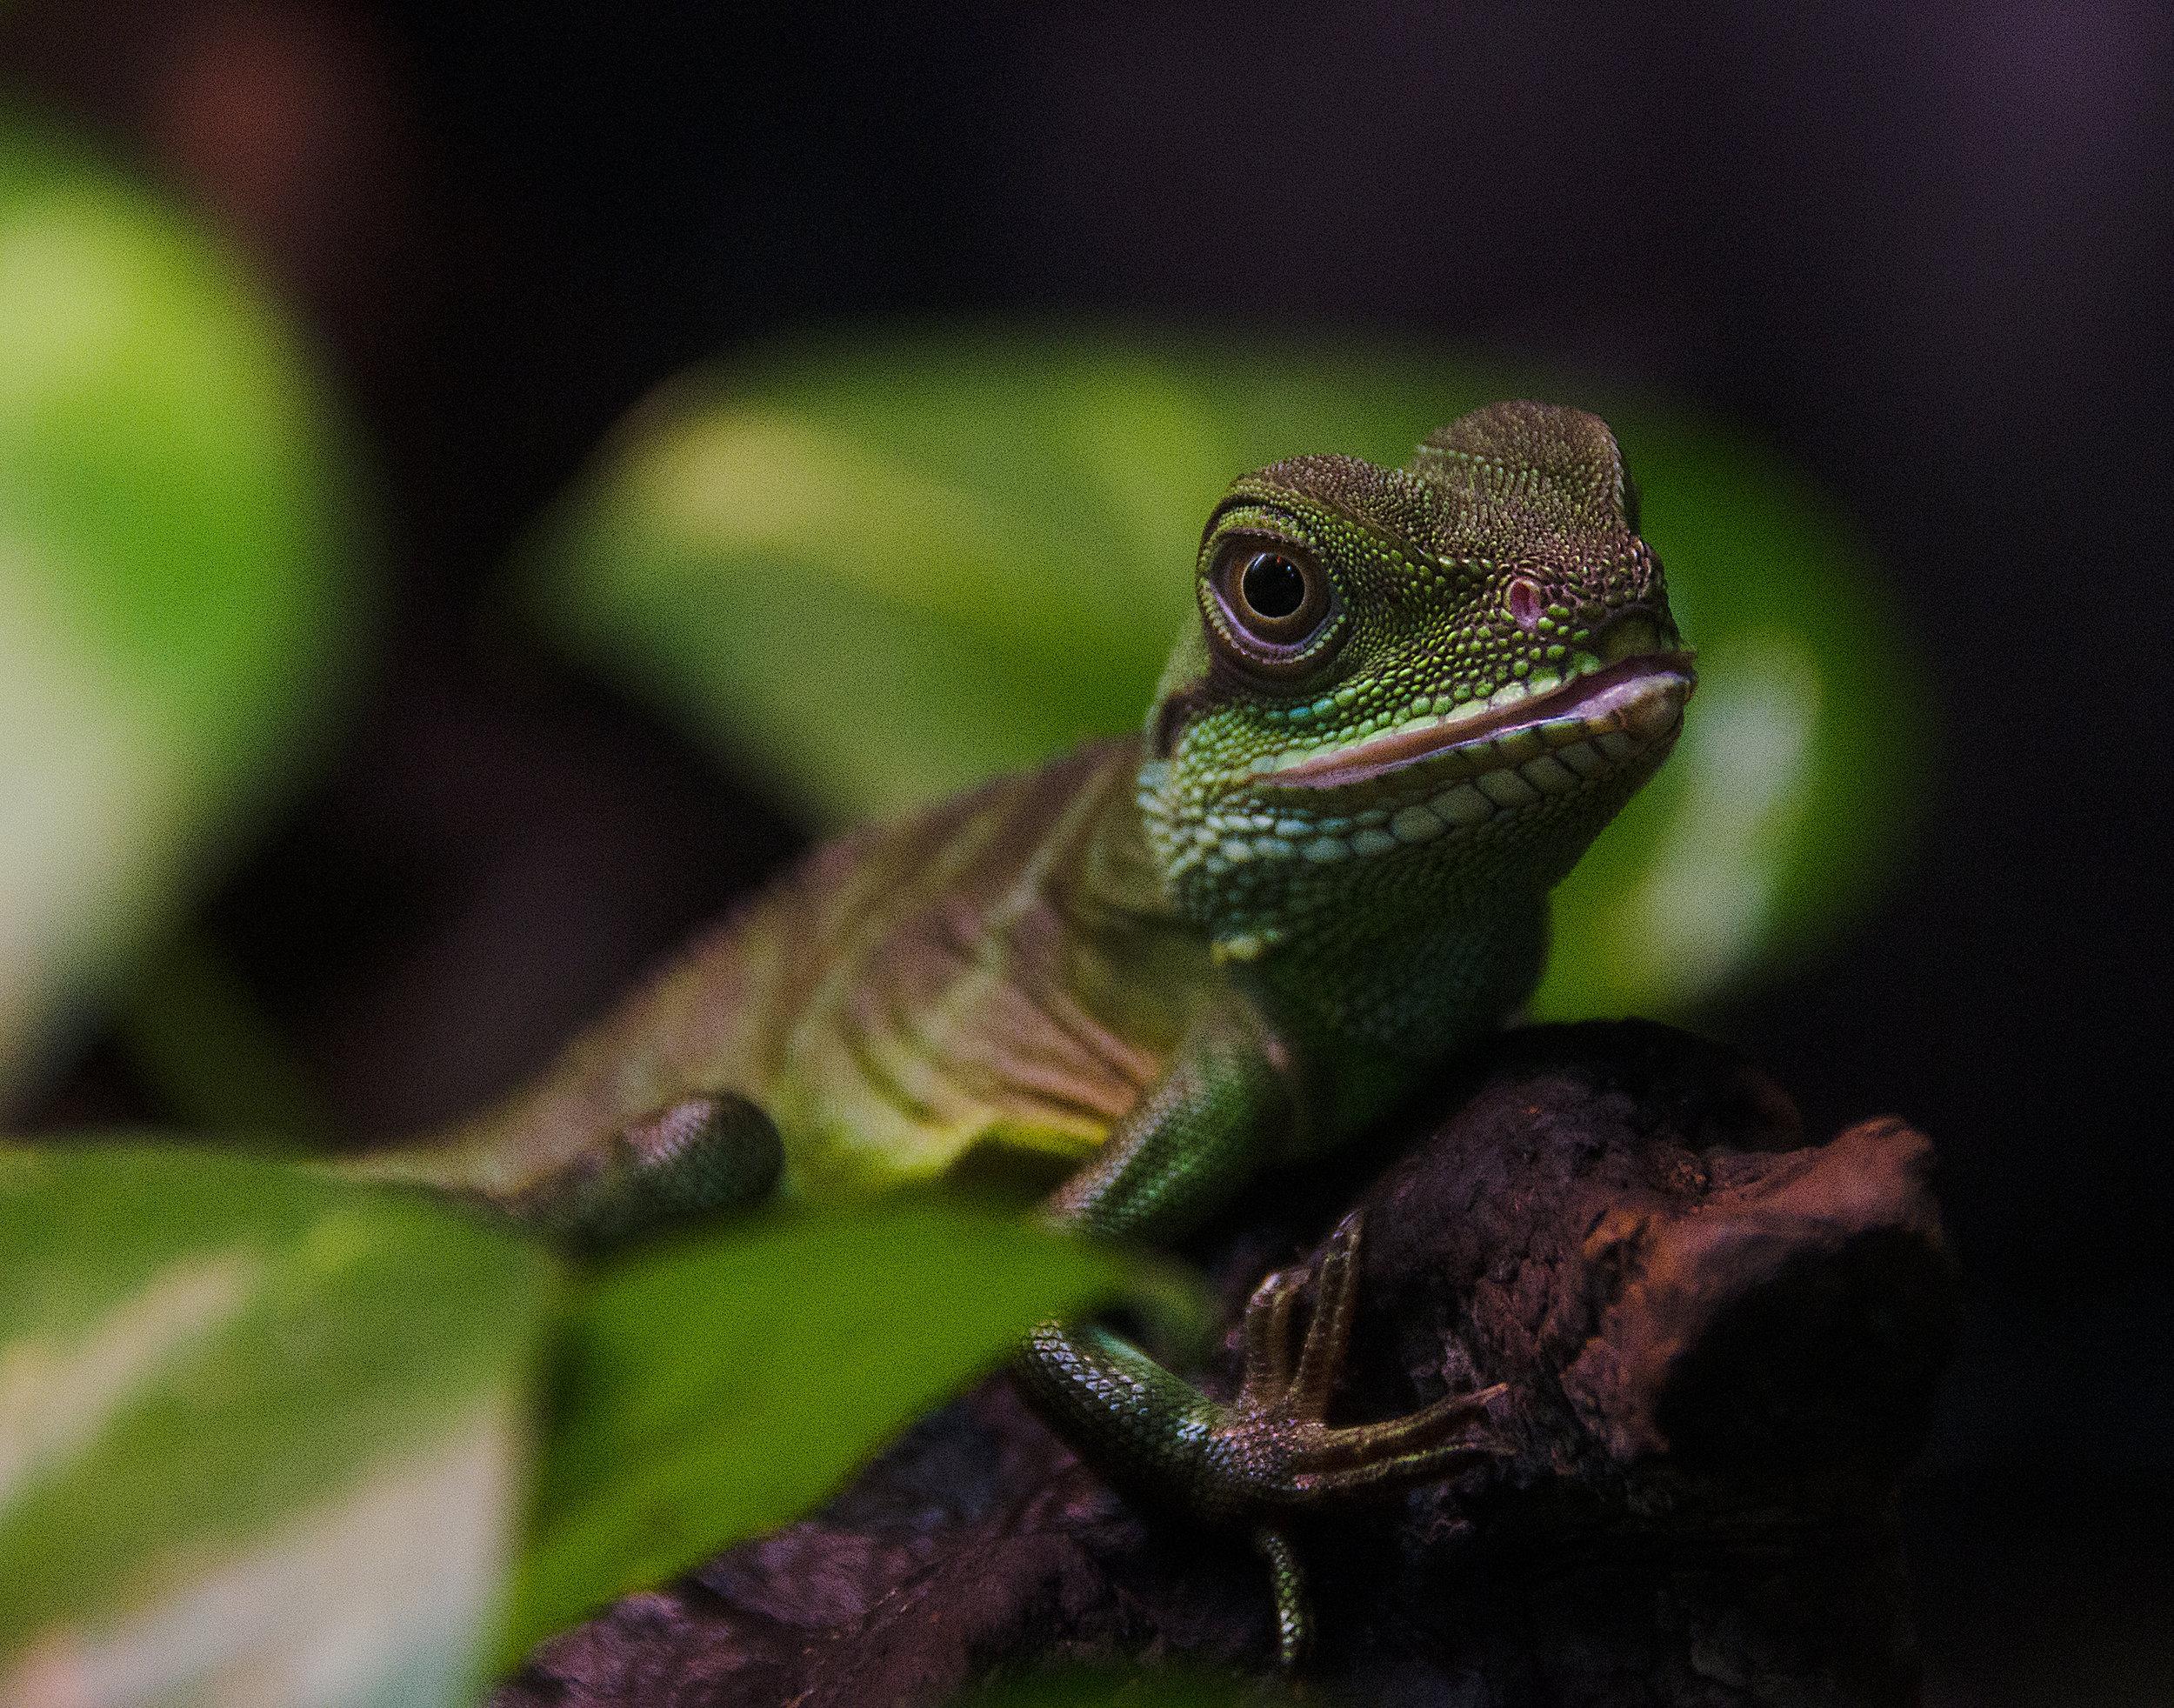 Spencer_Drake_Korean_Lizard_Photography_Lizard_Korean_Wildlife_Nature.jpg